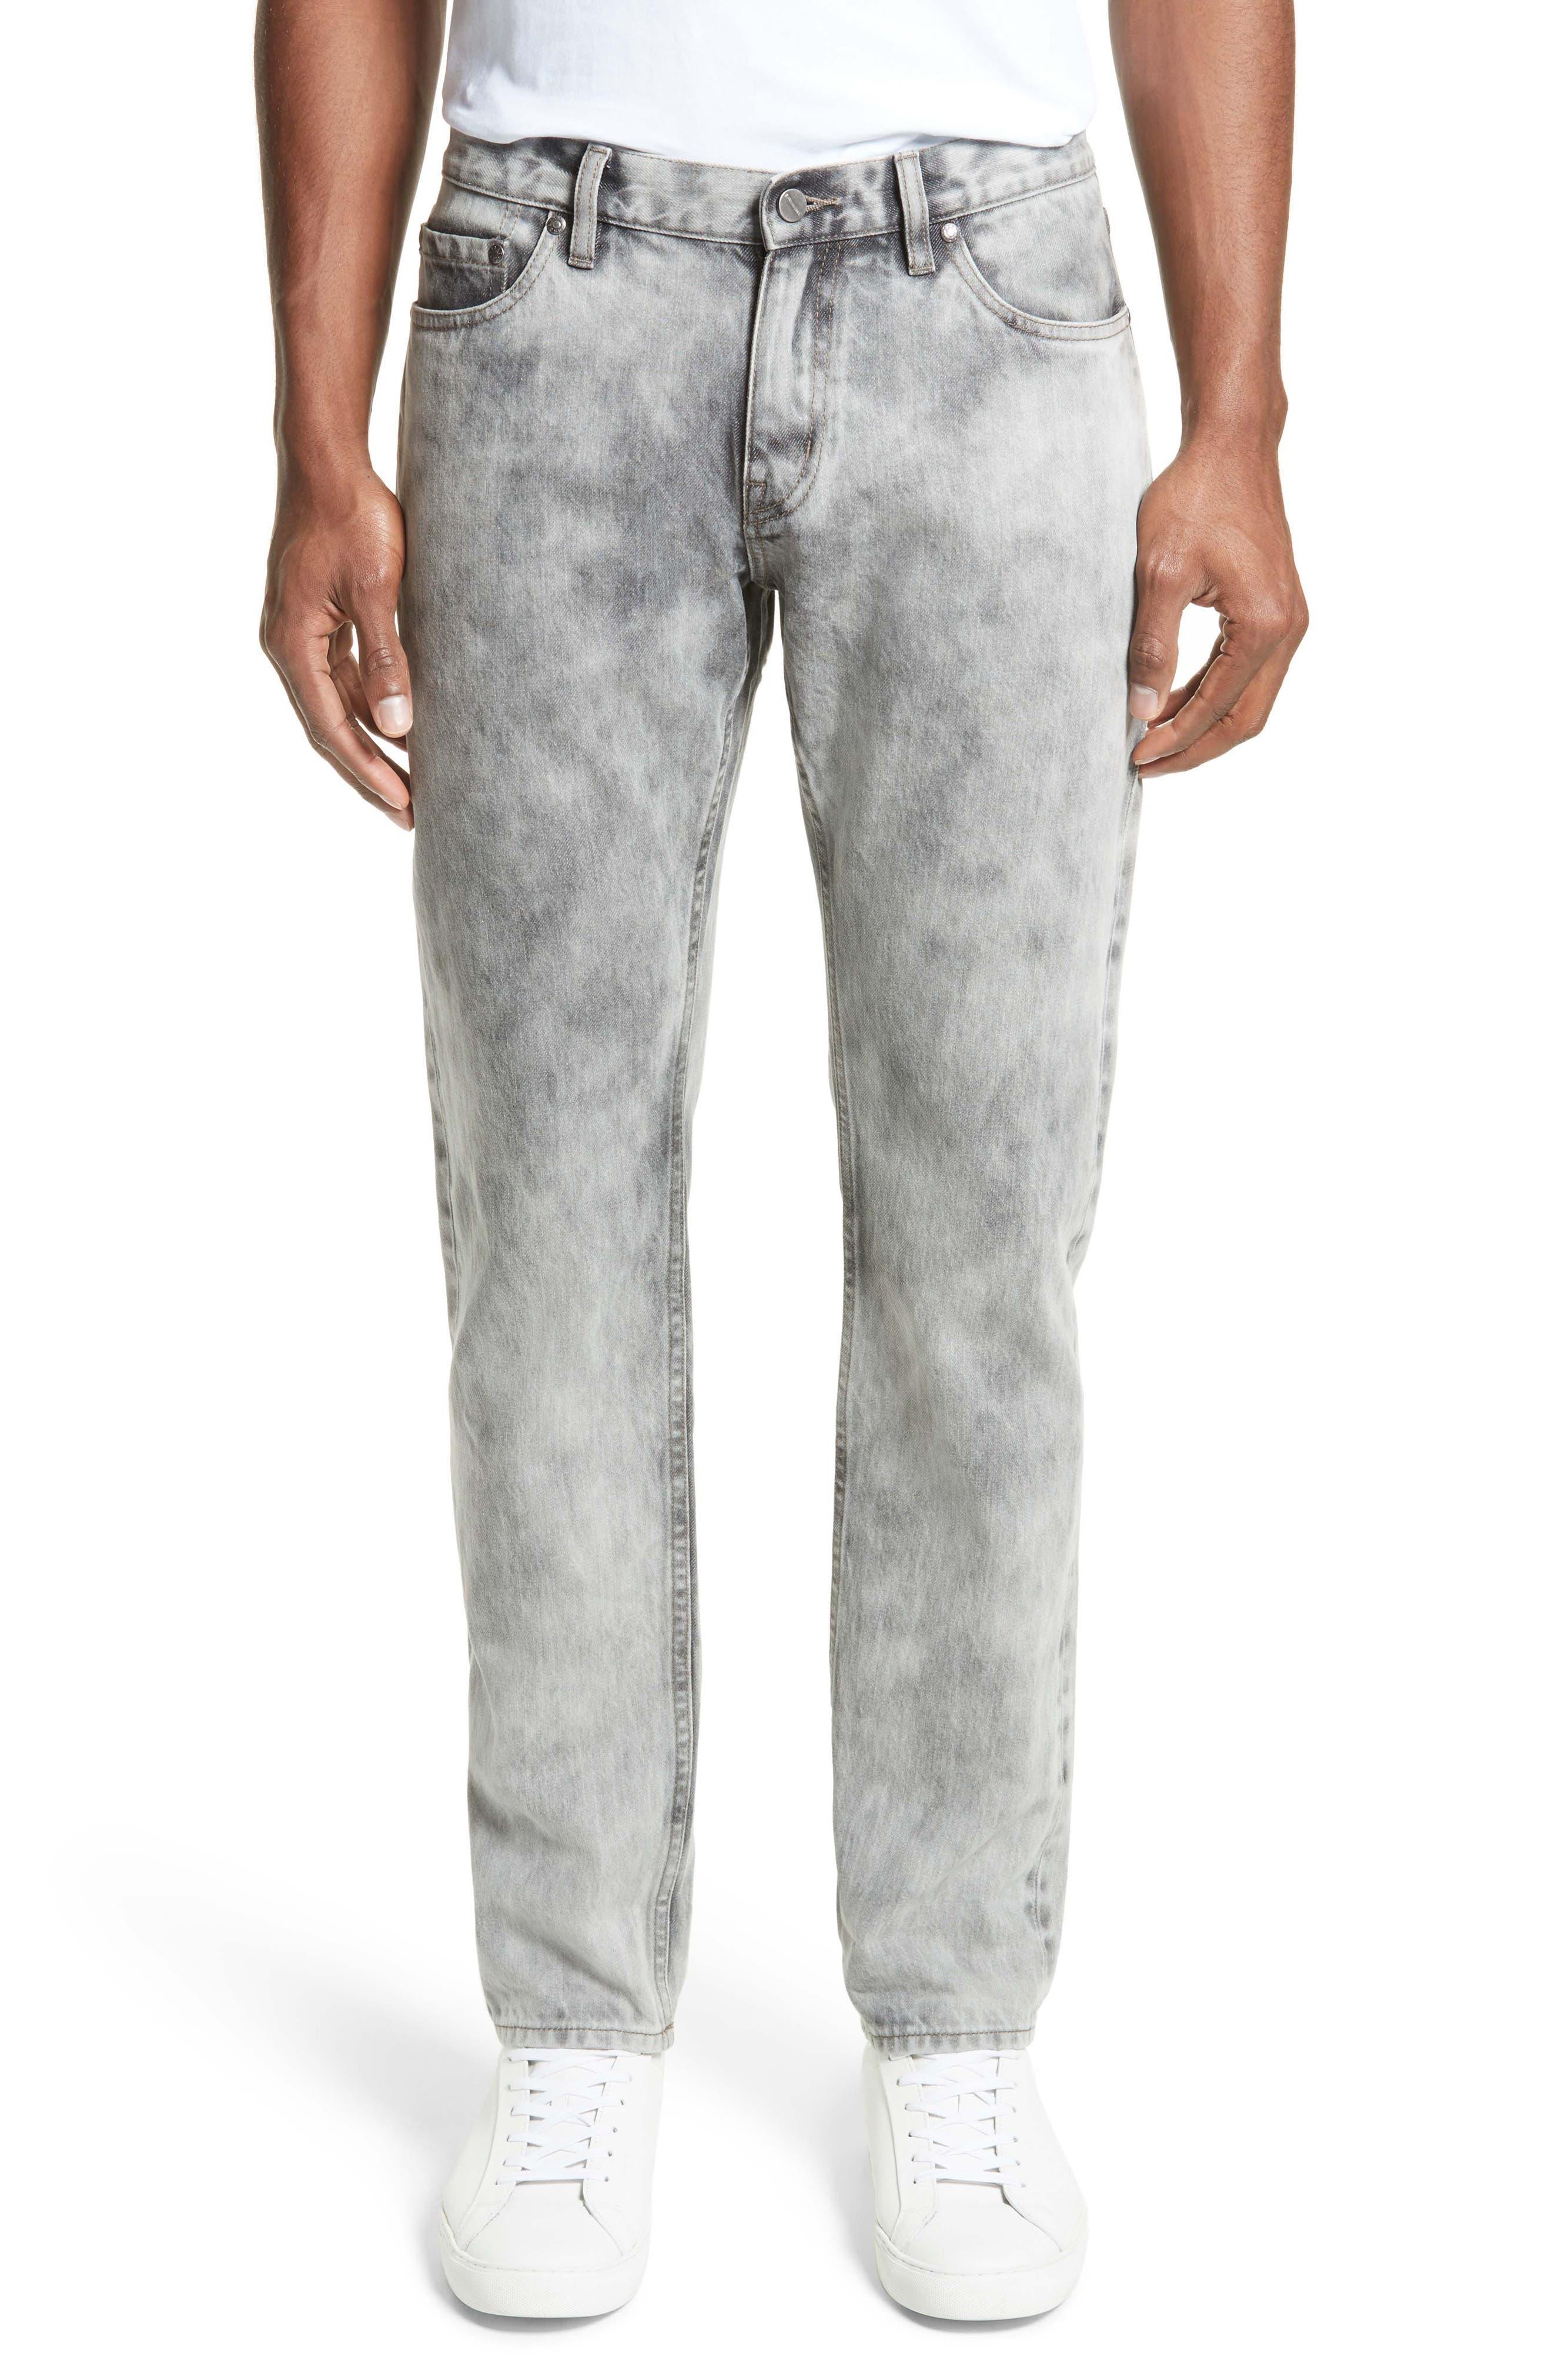 Alternate Image 1 Selected - Saturdays NYC Luke Straight Leg Jeans (Washed Black)